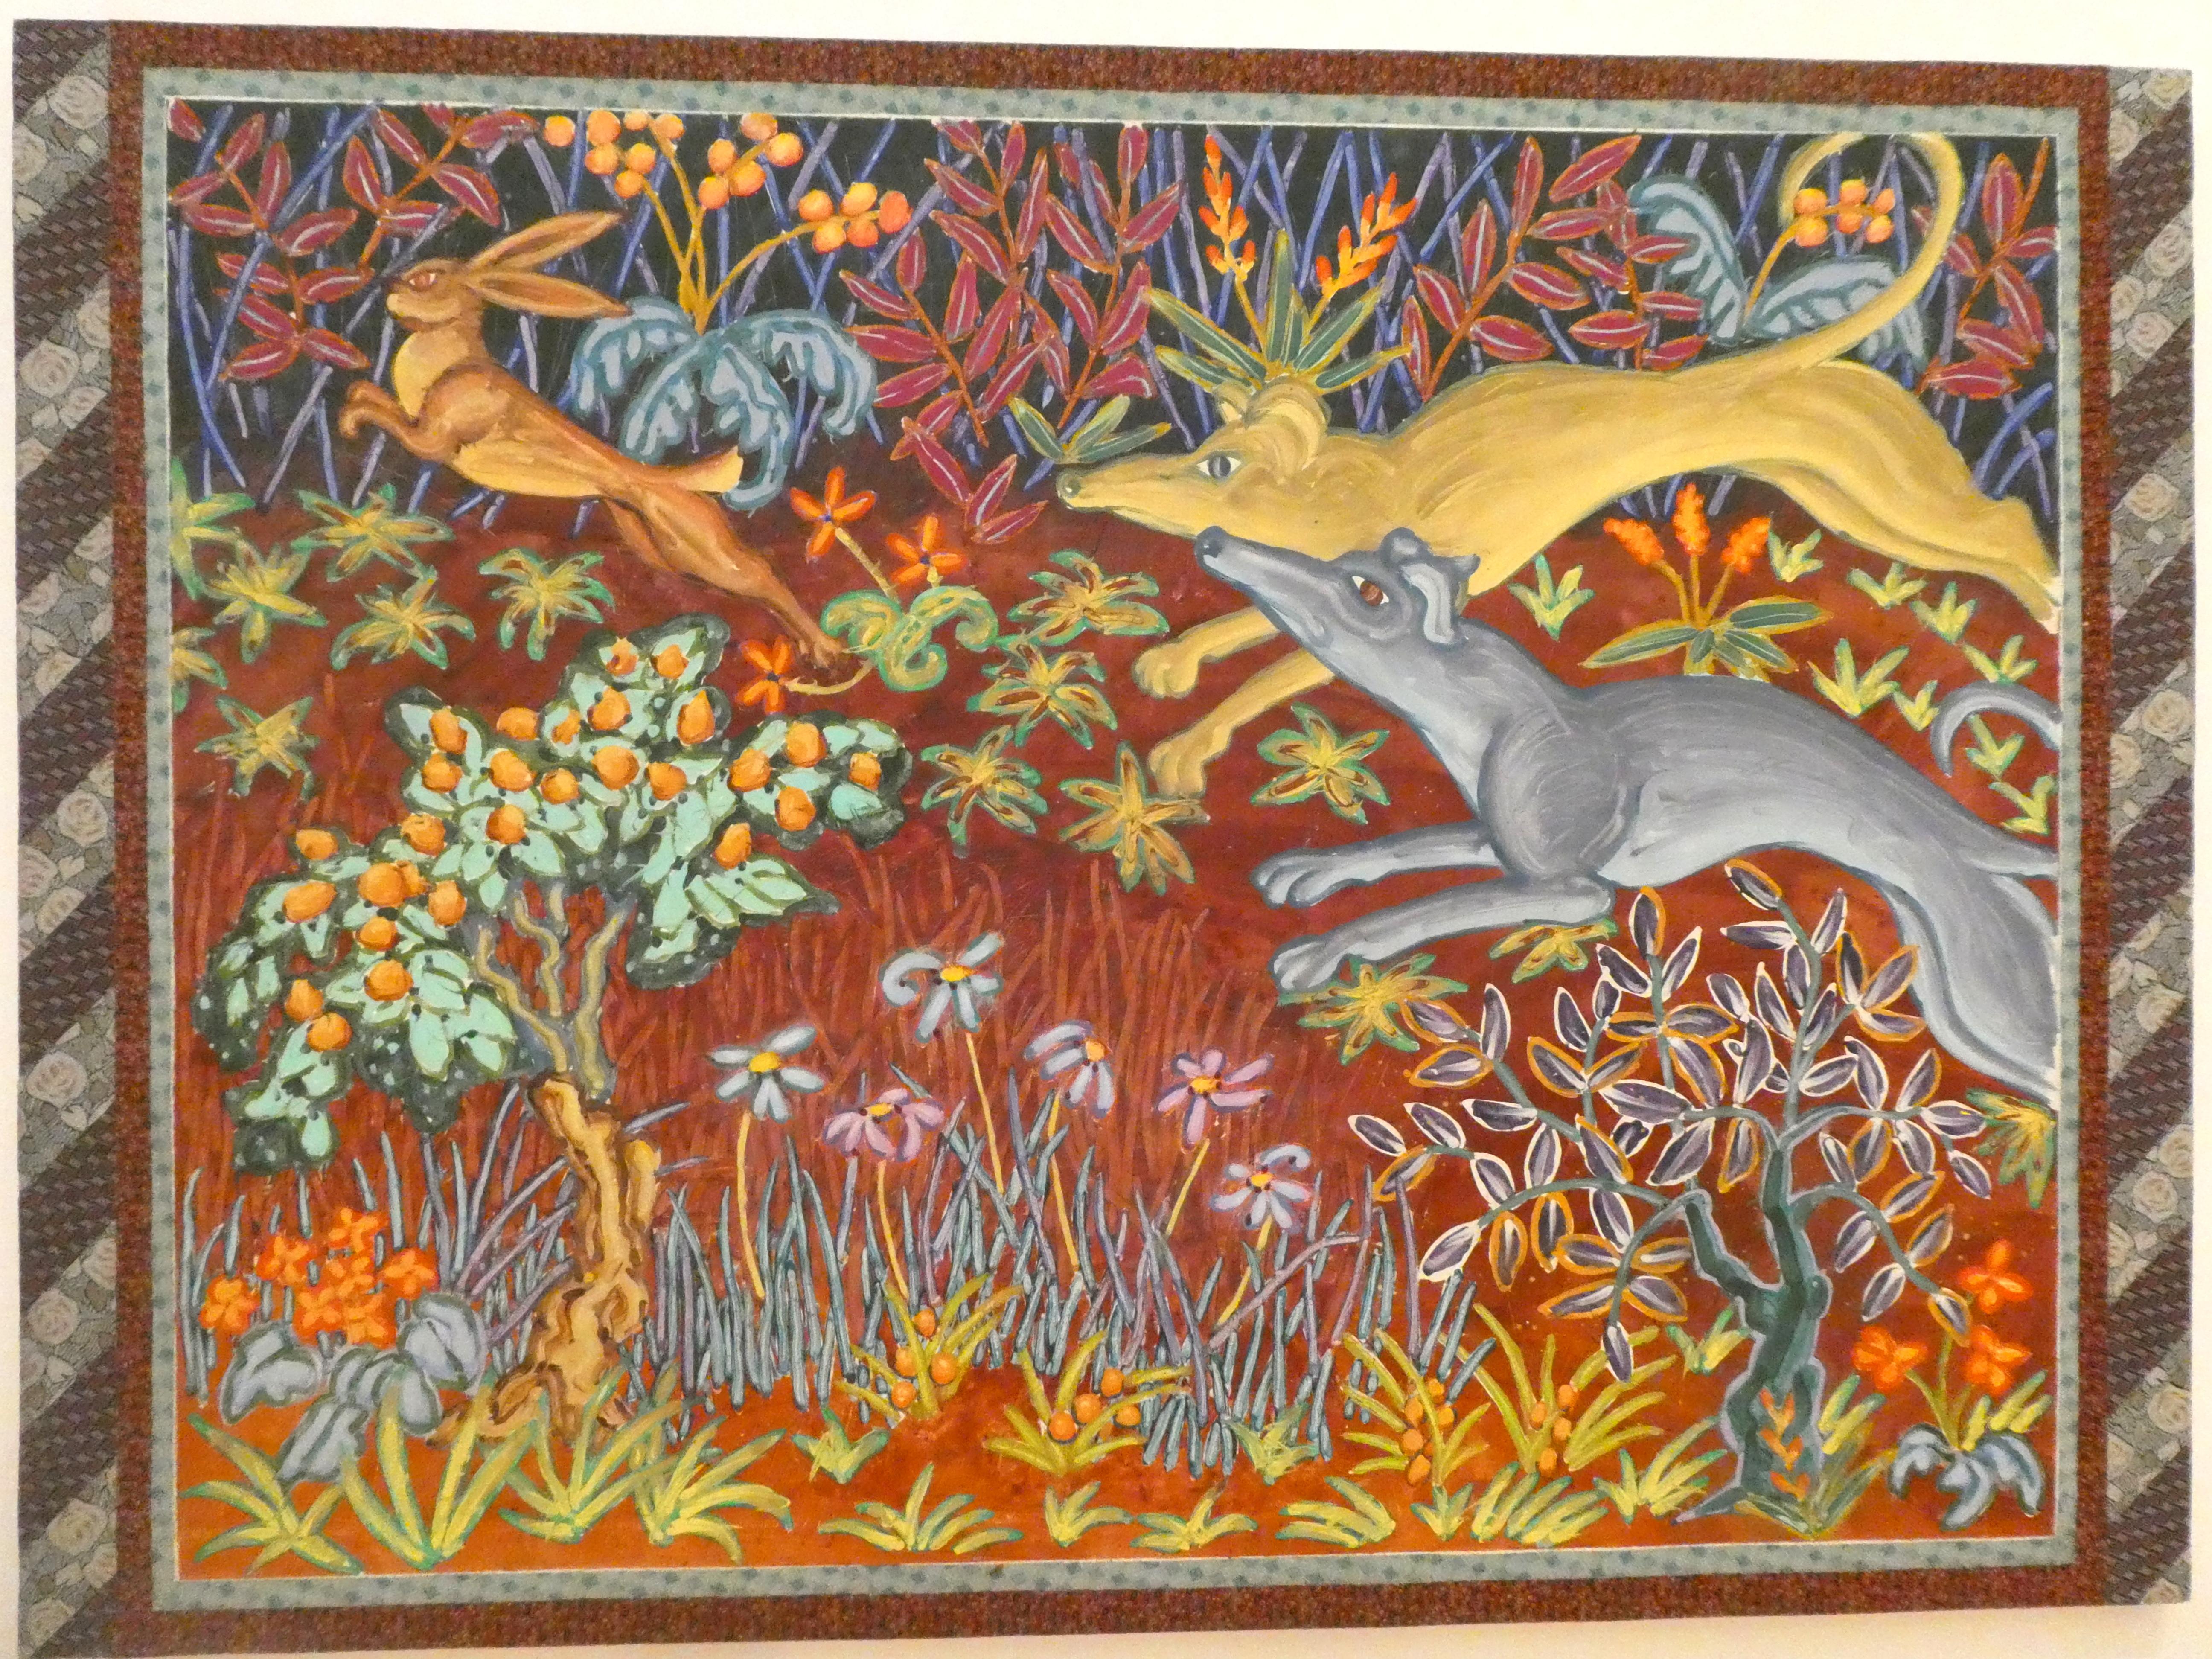 moca_pattern&decexhib_rabbit&hounds_feb2020